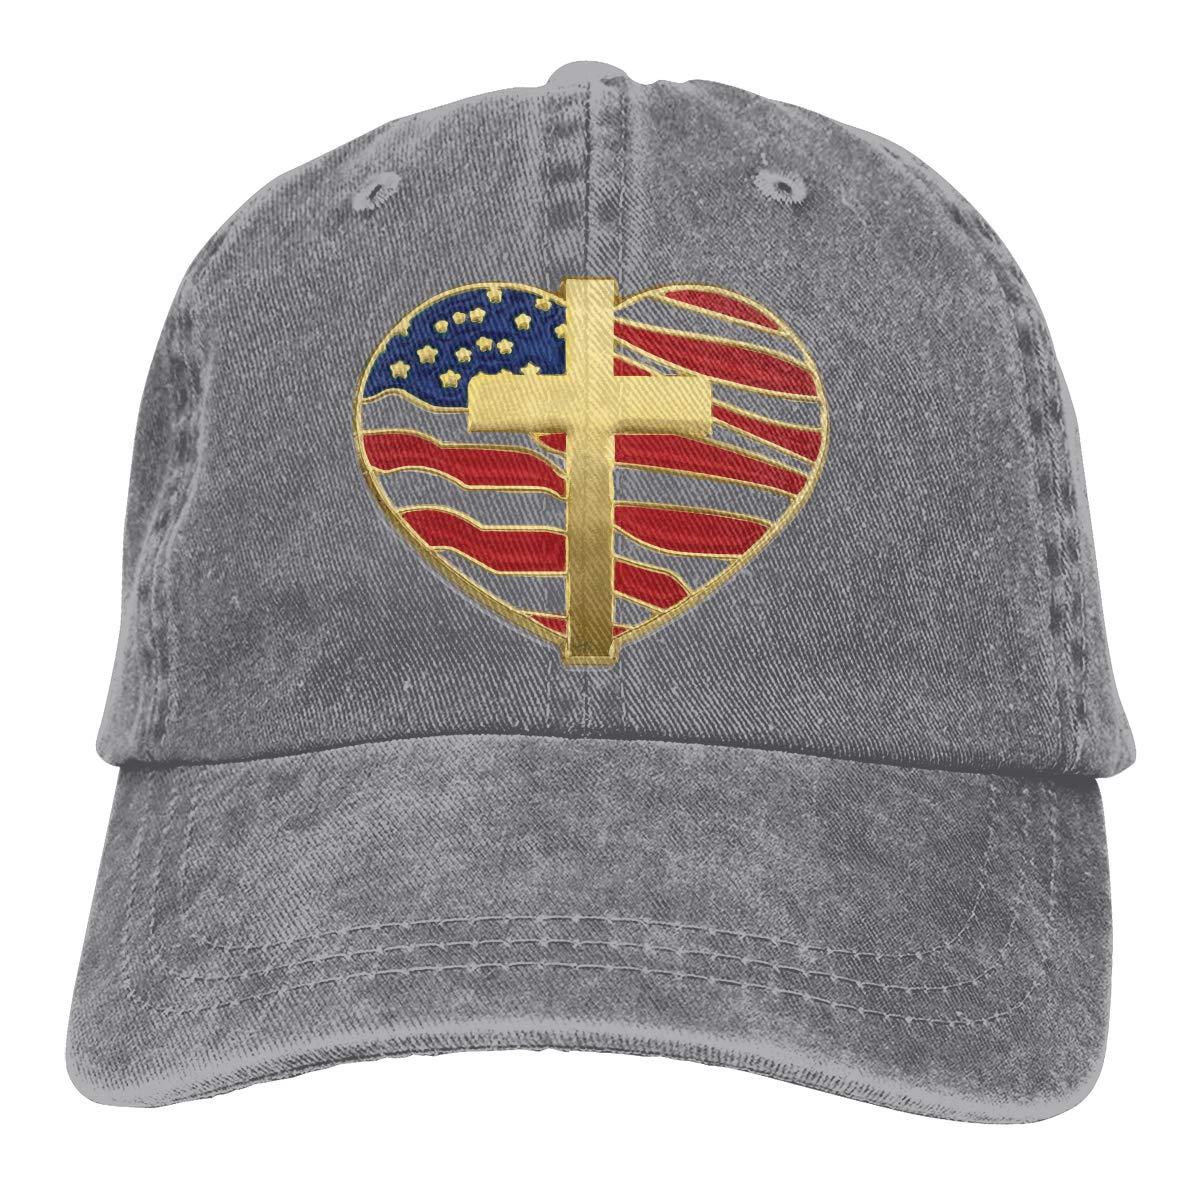 Angel Flag Unisex Custom Cowboy Casquette Adjustable Baseball Cap